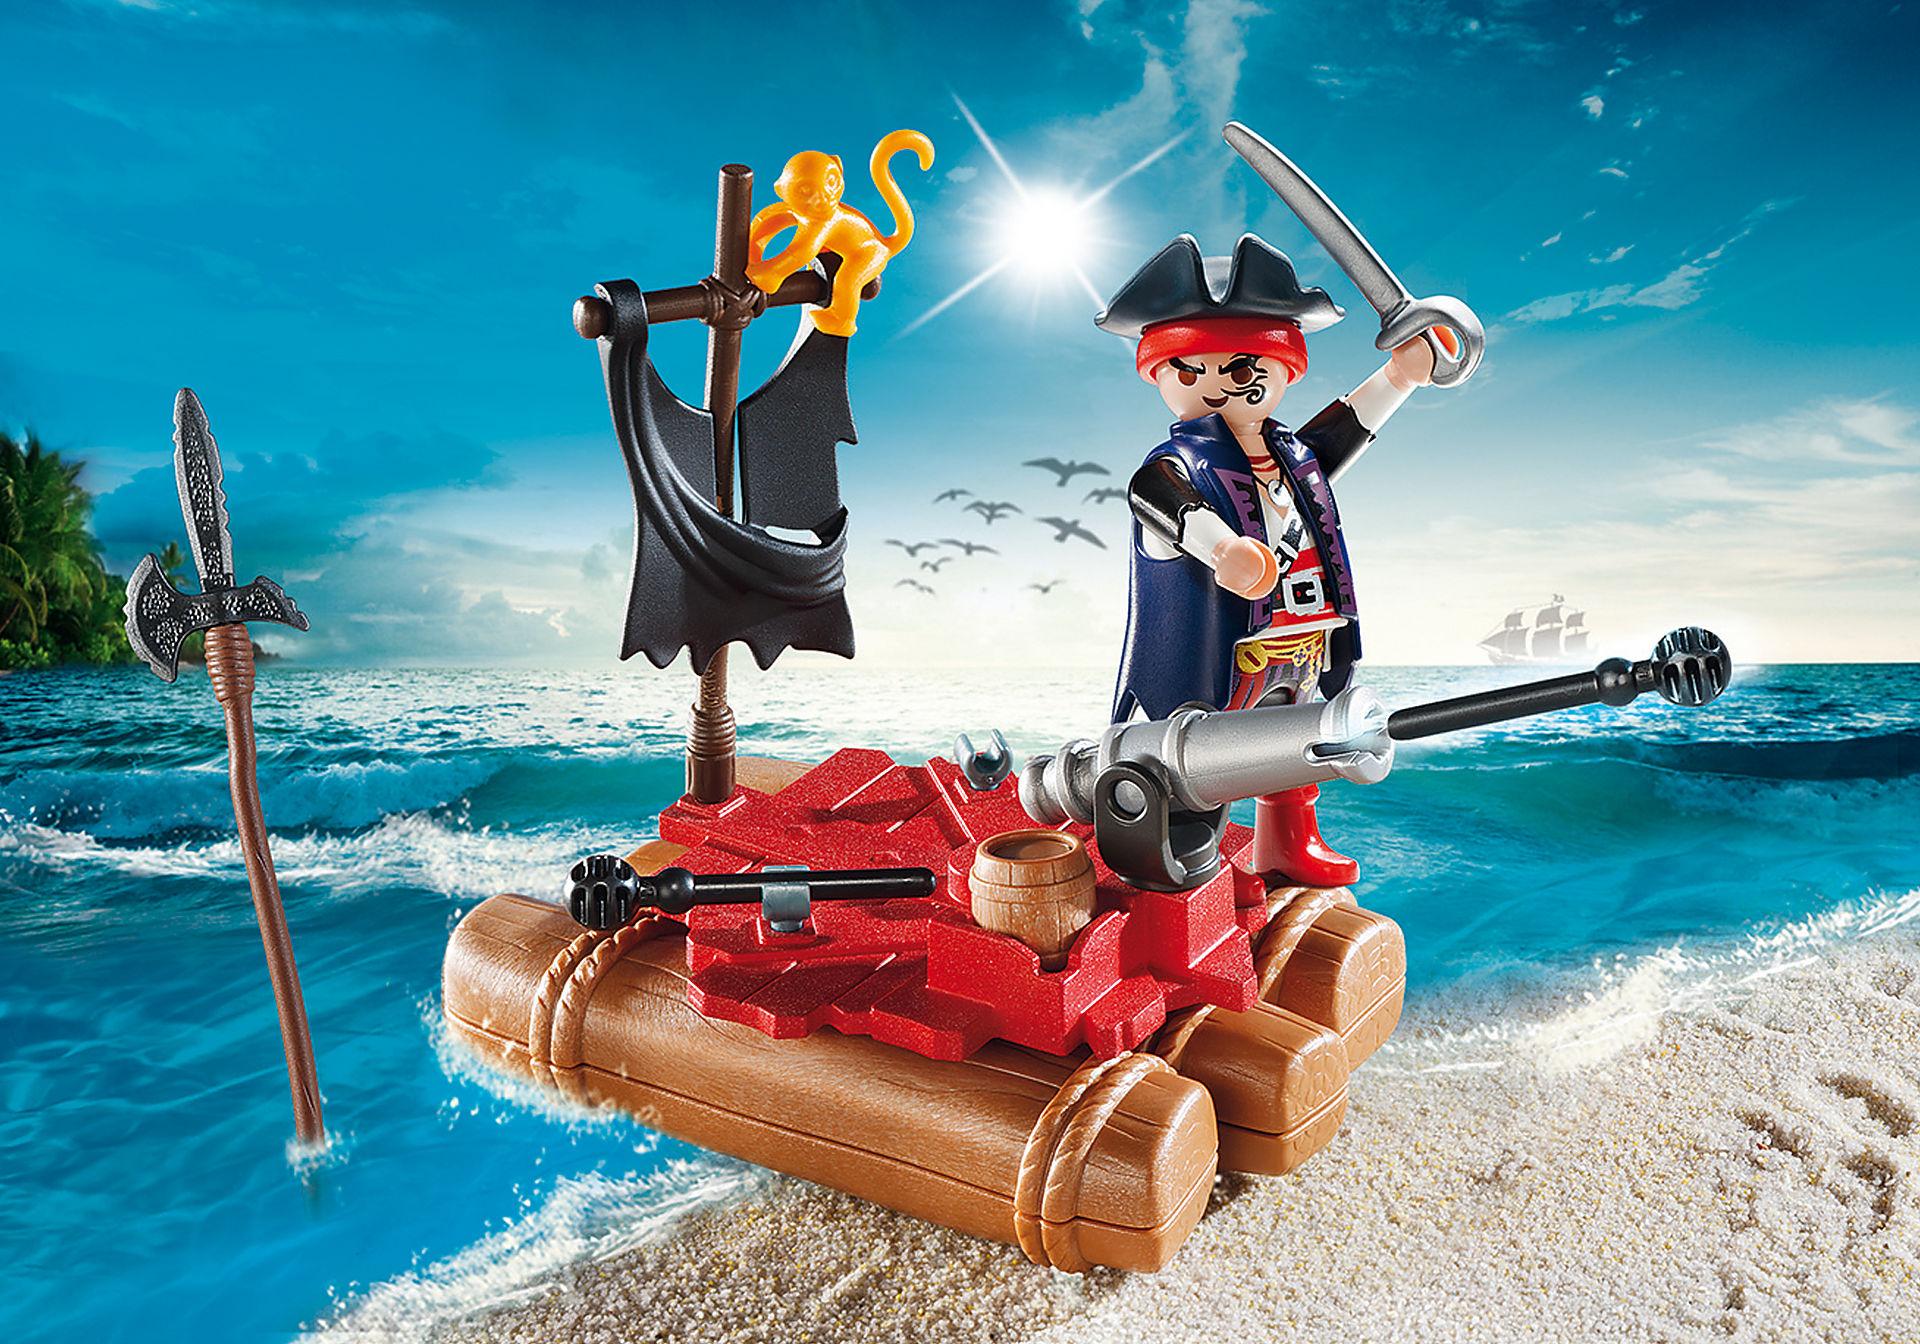 http://media.playmobil.com/i/playmobil/5655_product_detail/Βαλιτσάκι Πειρατής με σχεδία